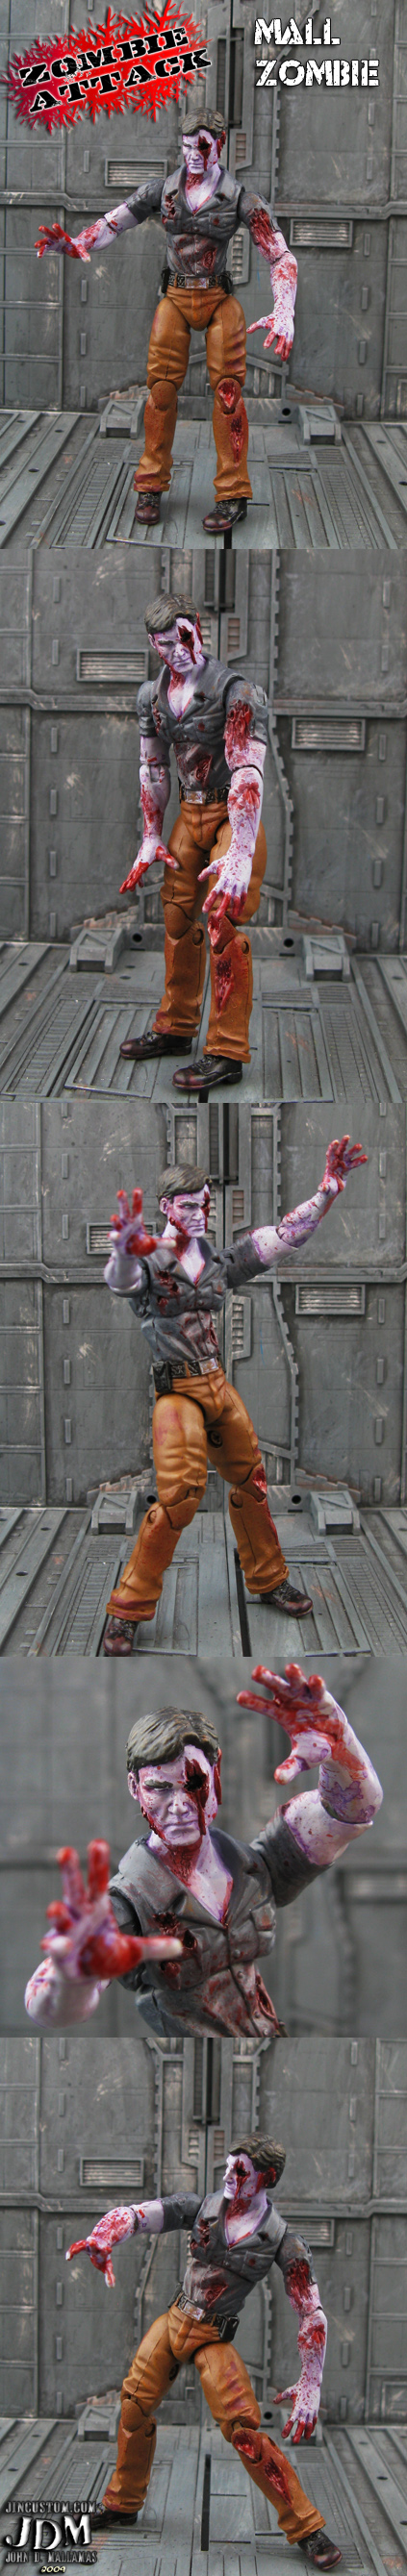 Mall Zombie